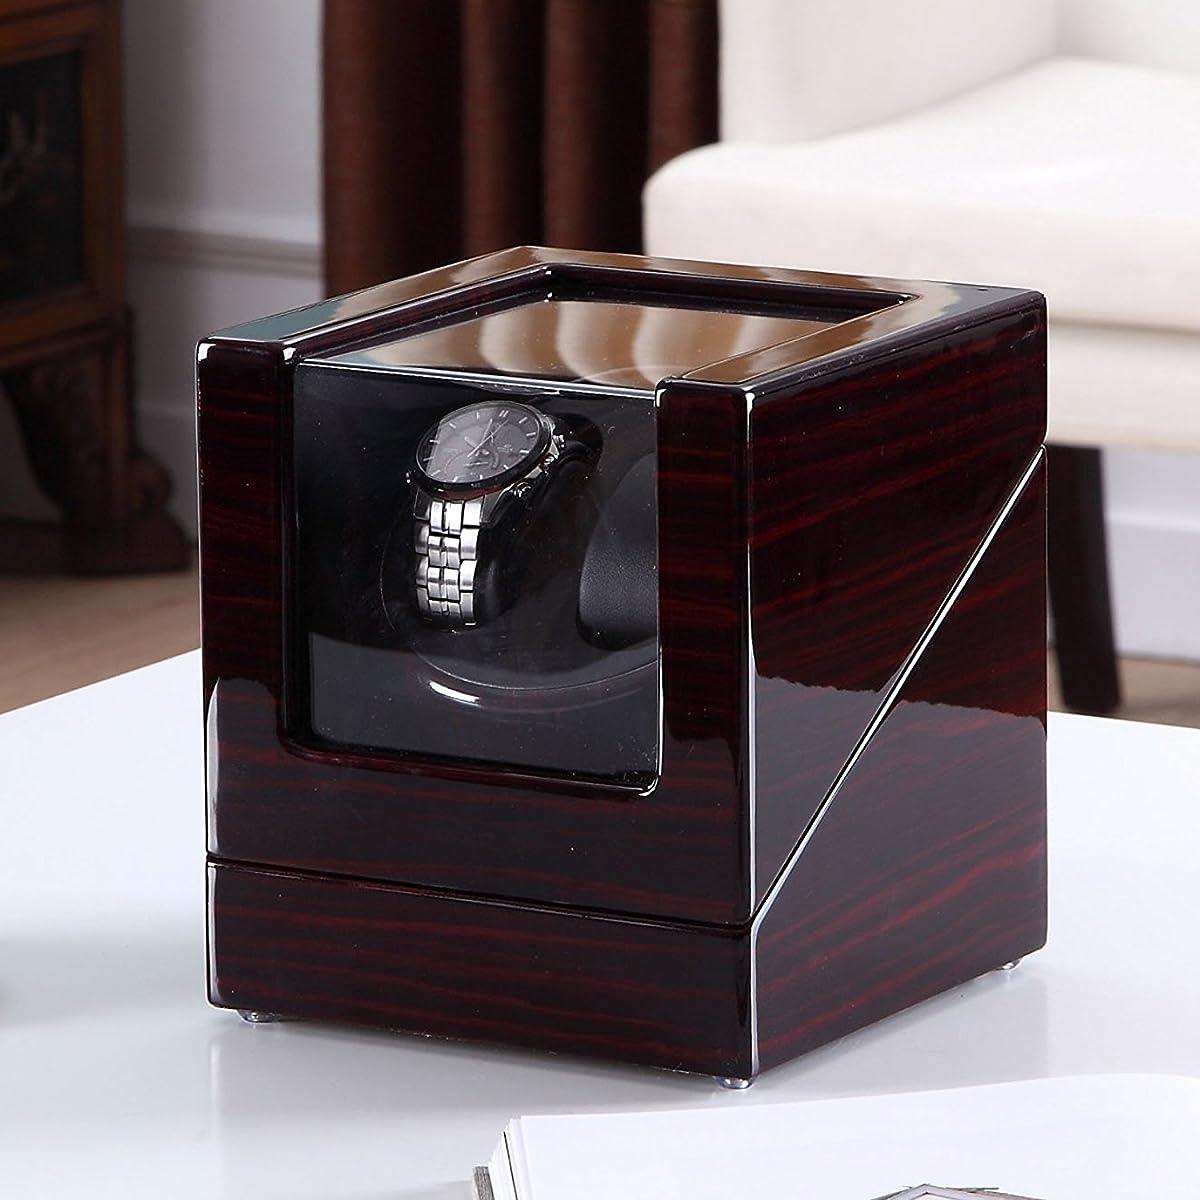 HiPai Automatic Double Watch Winder, Quiet Motor 5 Rotation Modes Self Winding Watch Rotator Box